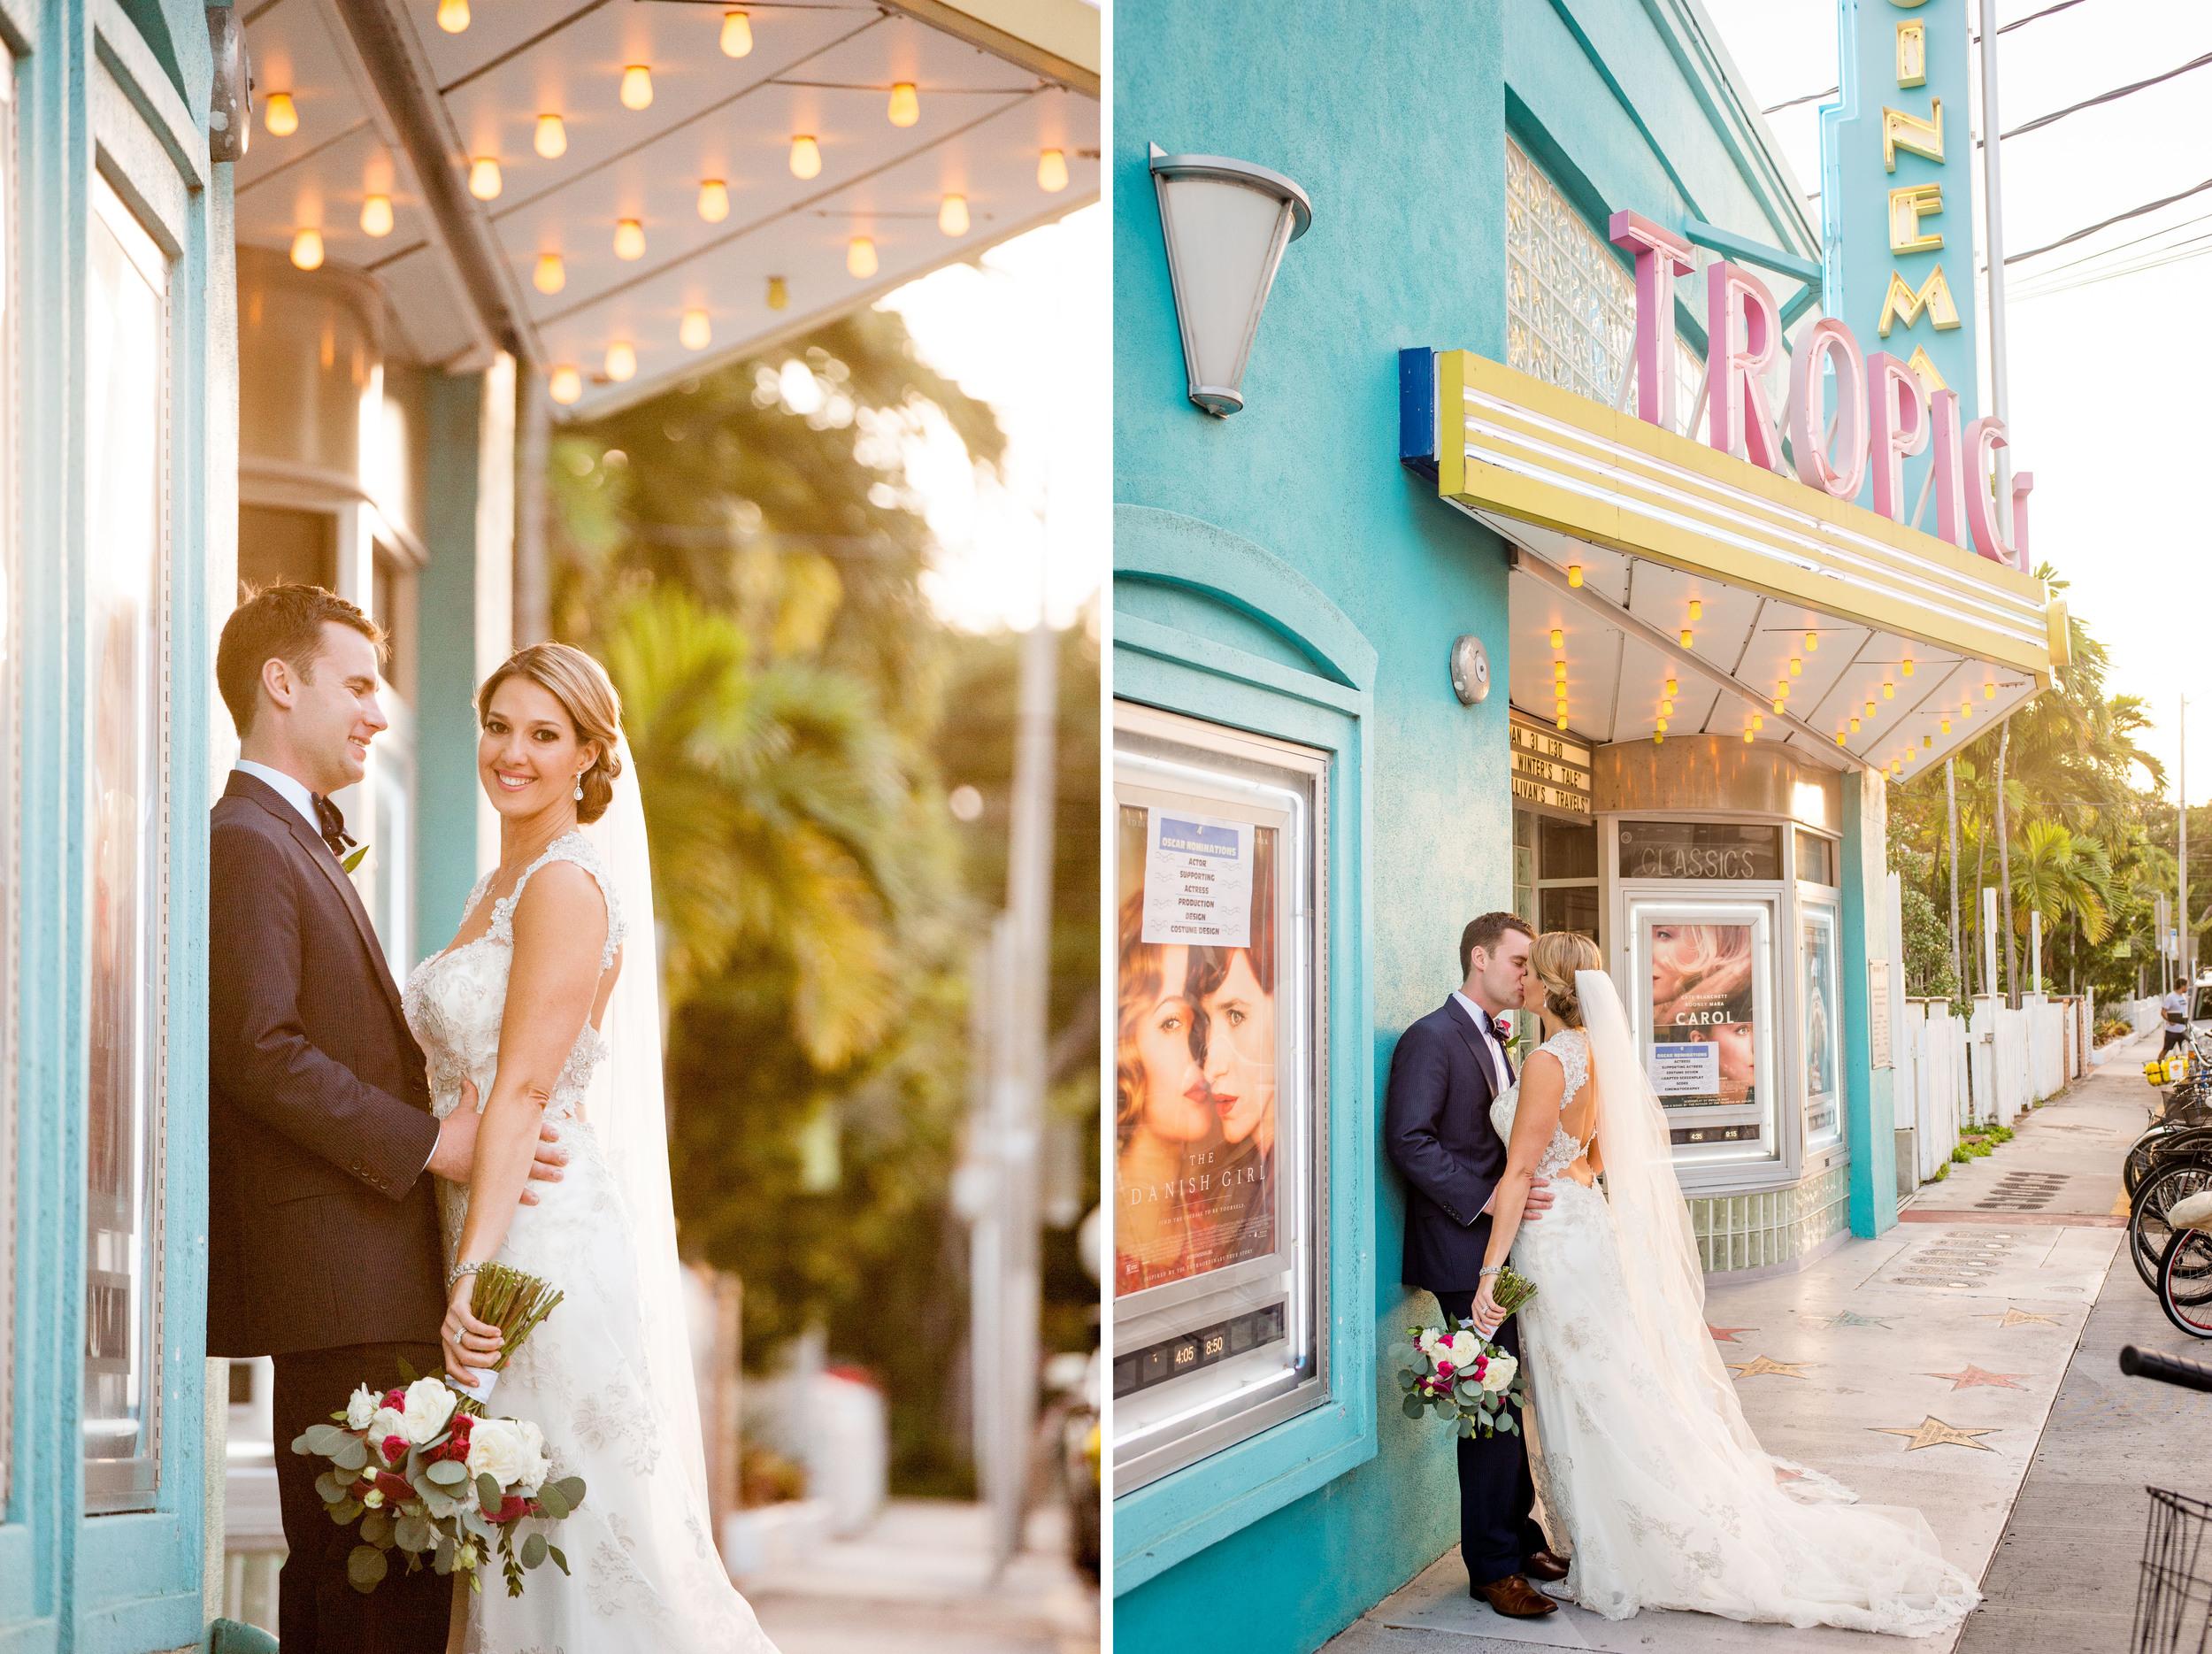 ocean-key-resort-key-west-wedding-044.jpg